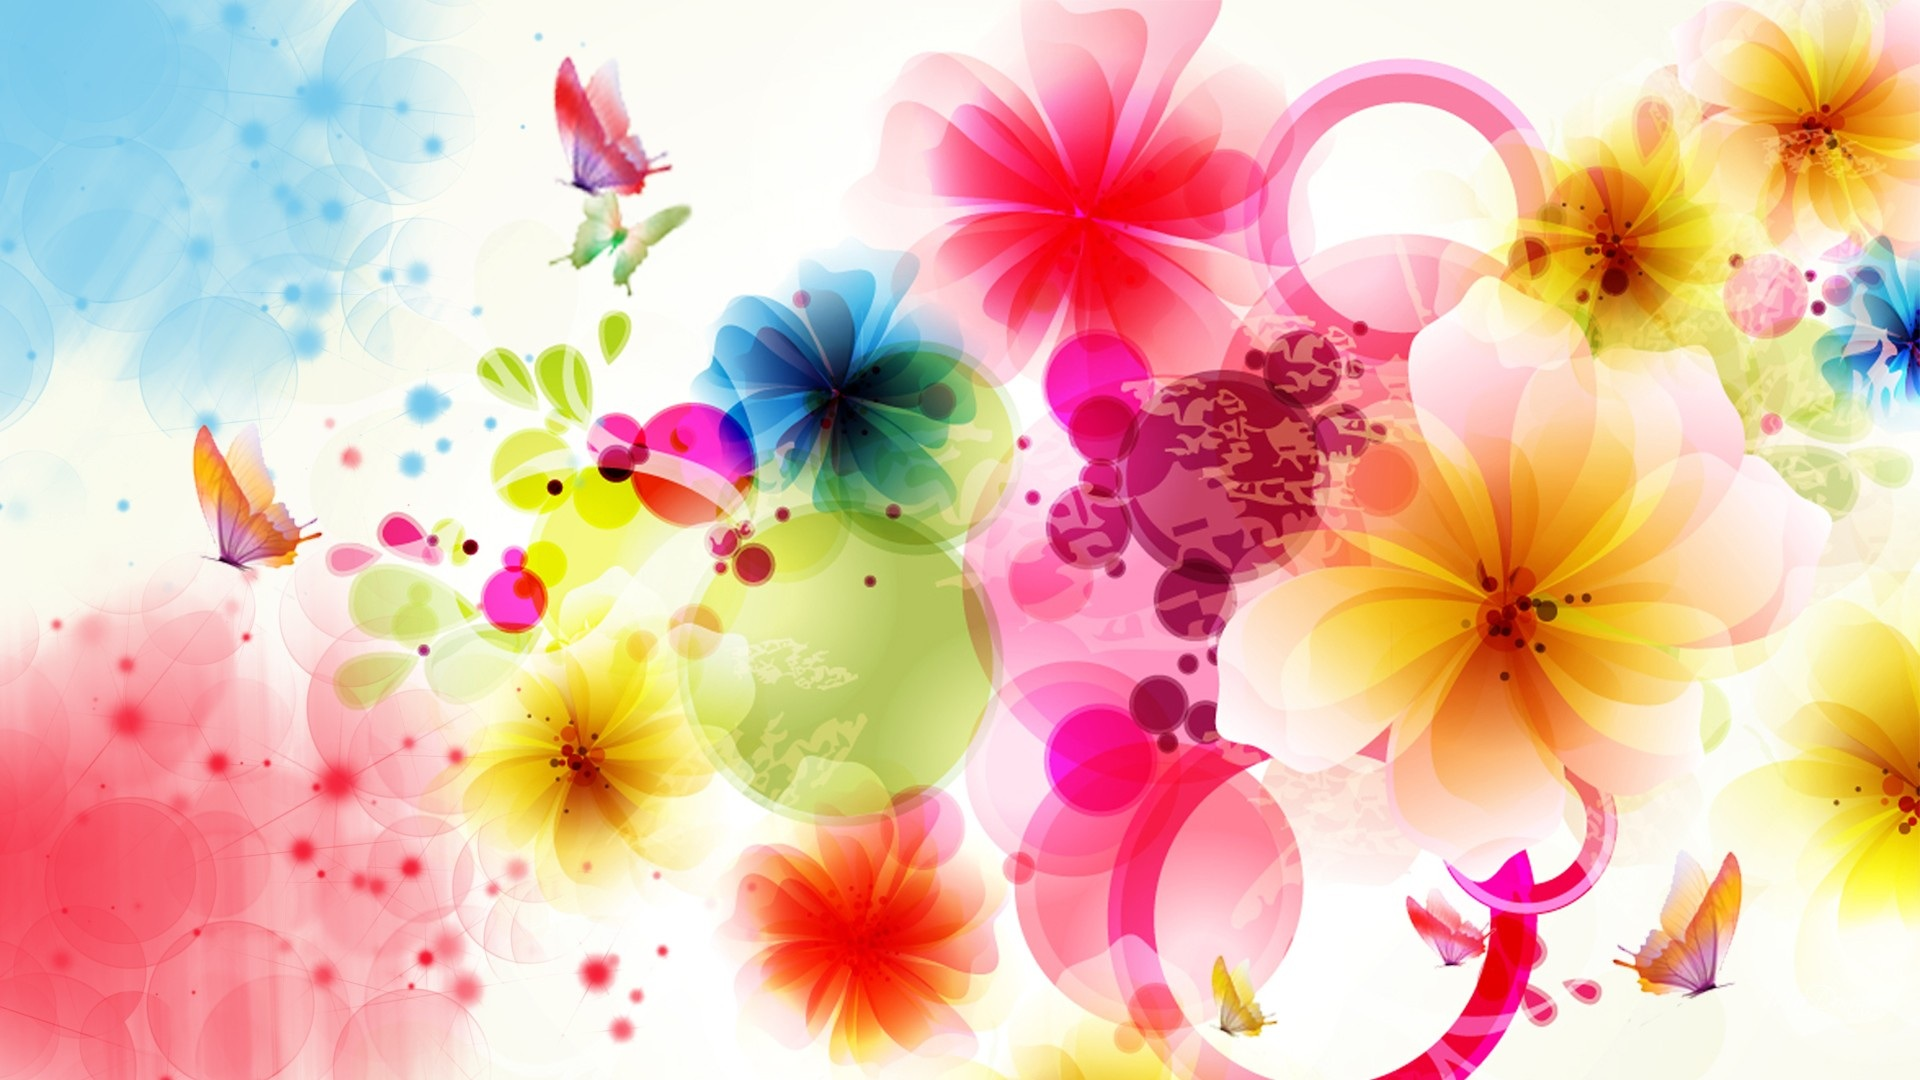 Flores Y Mariposas De Dise  O Vectorial Fondos De Pantalla   1920x1080